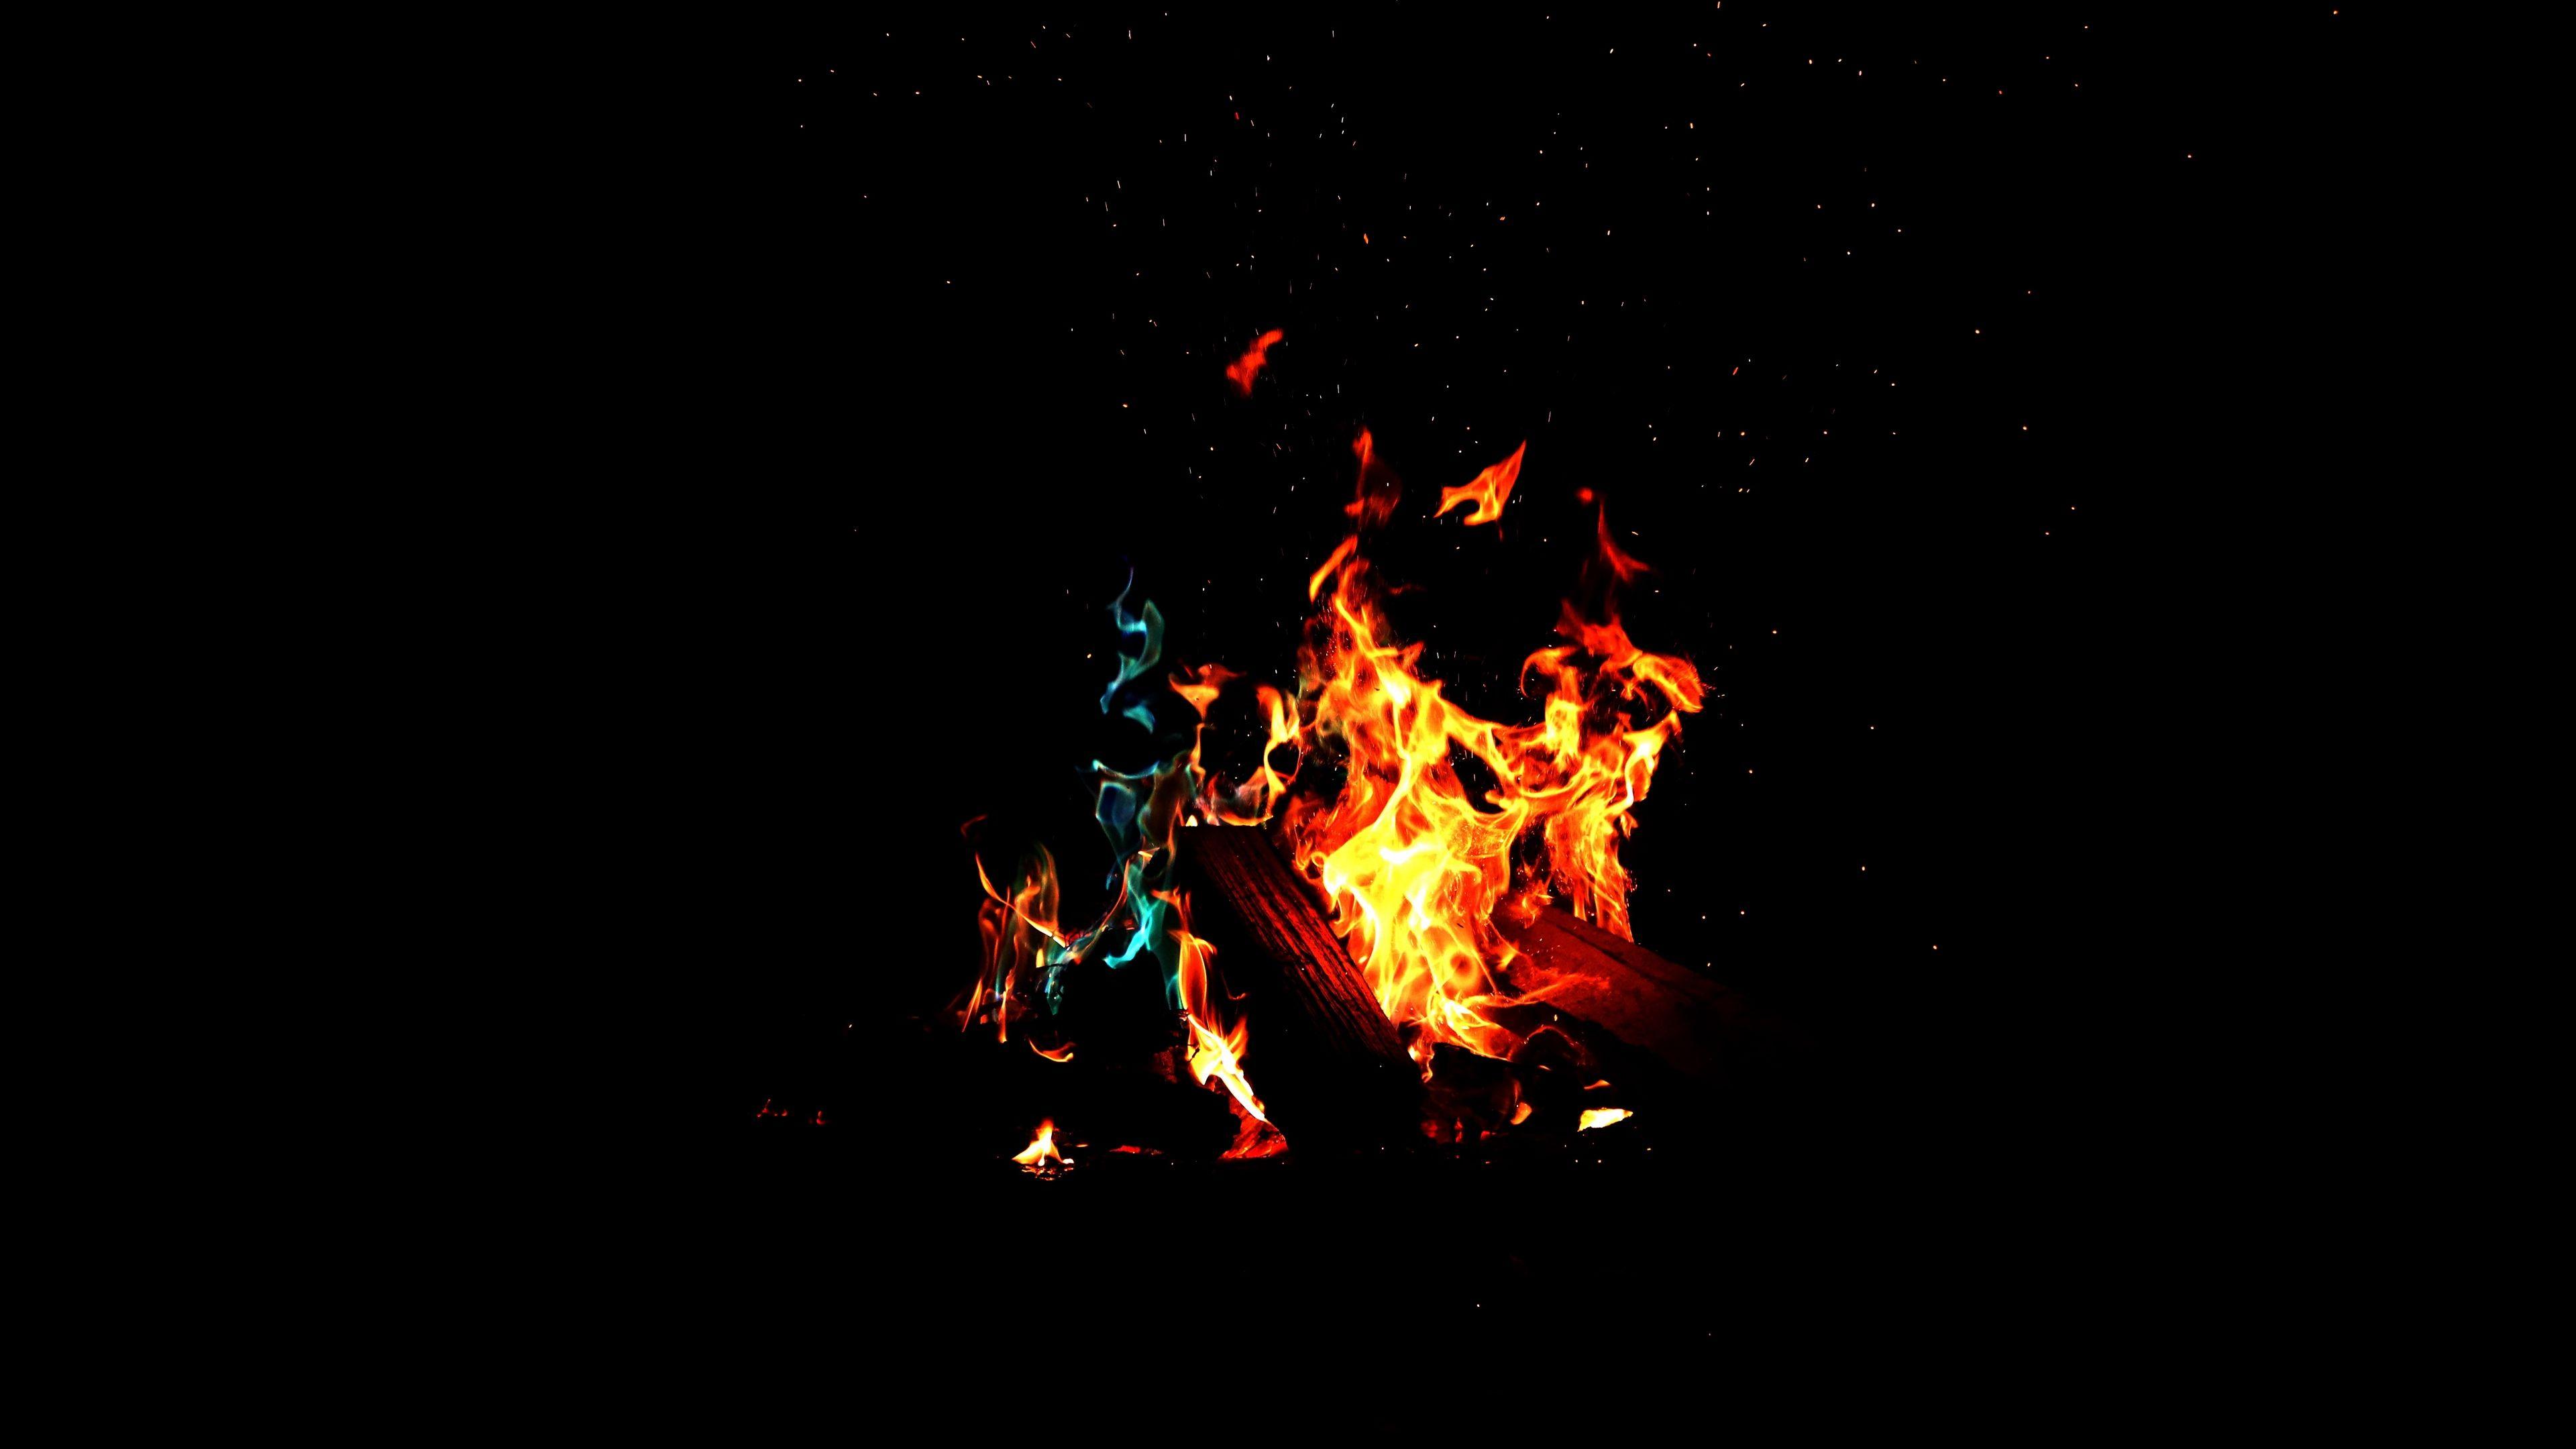 Fire Flame Dark 4k Flame Fire Dark In 2020 Black Wallpaper Red Wallpaper Low Light Photography